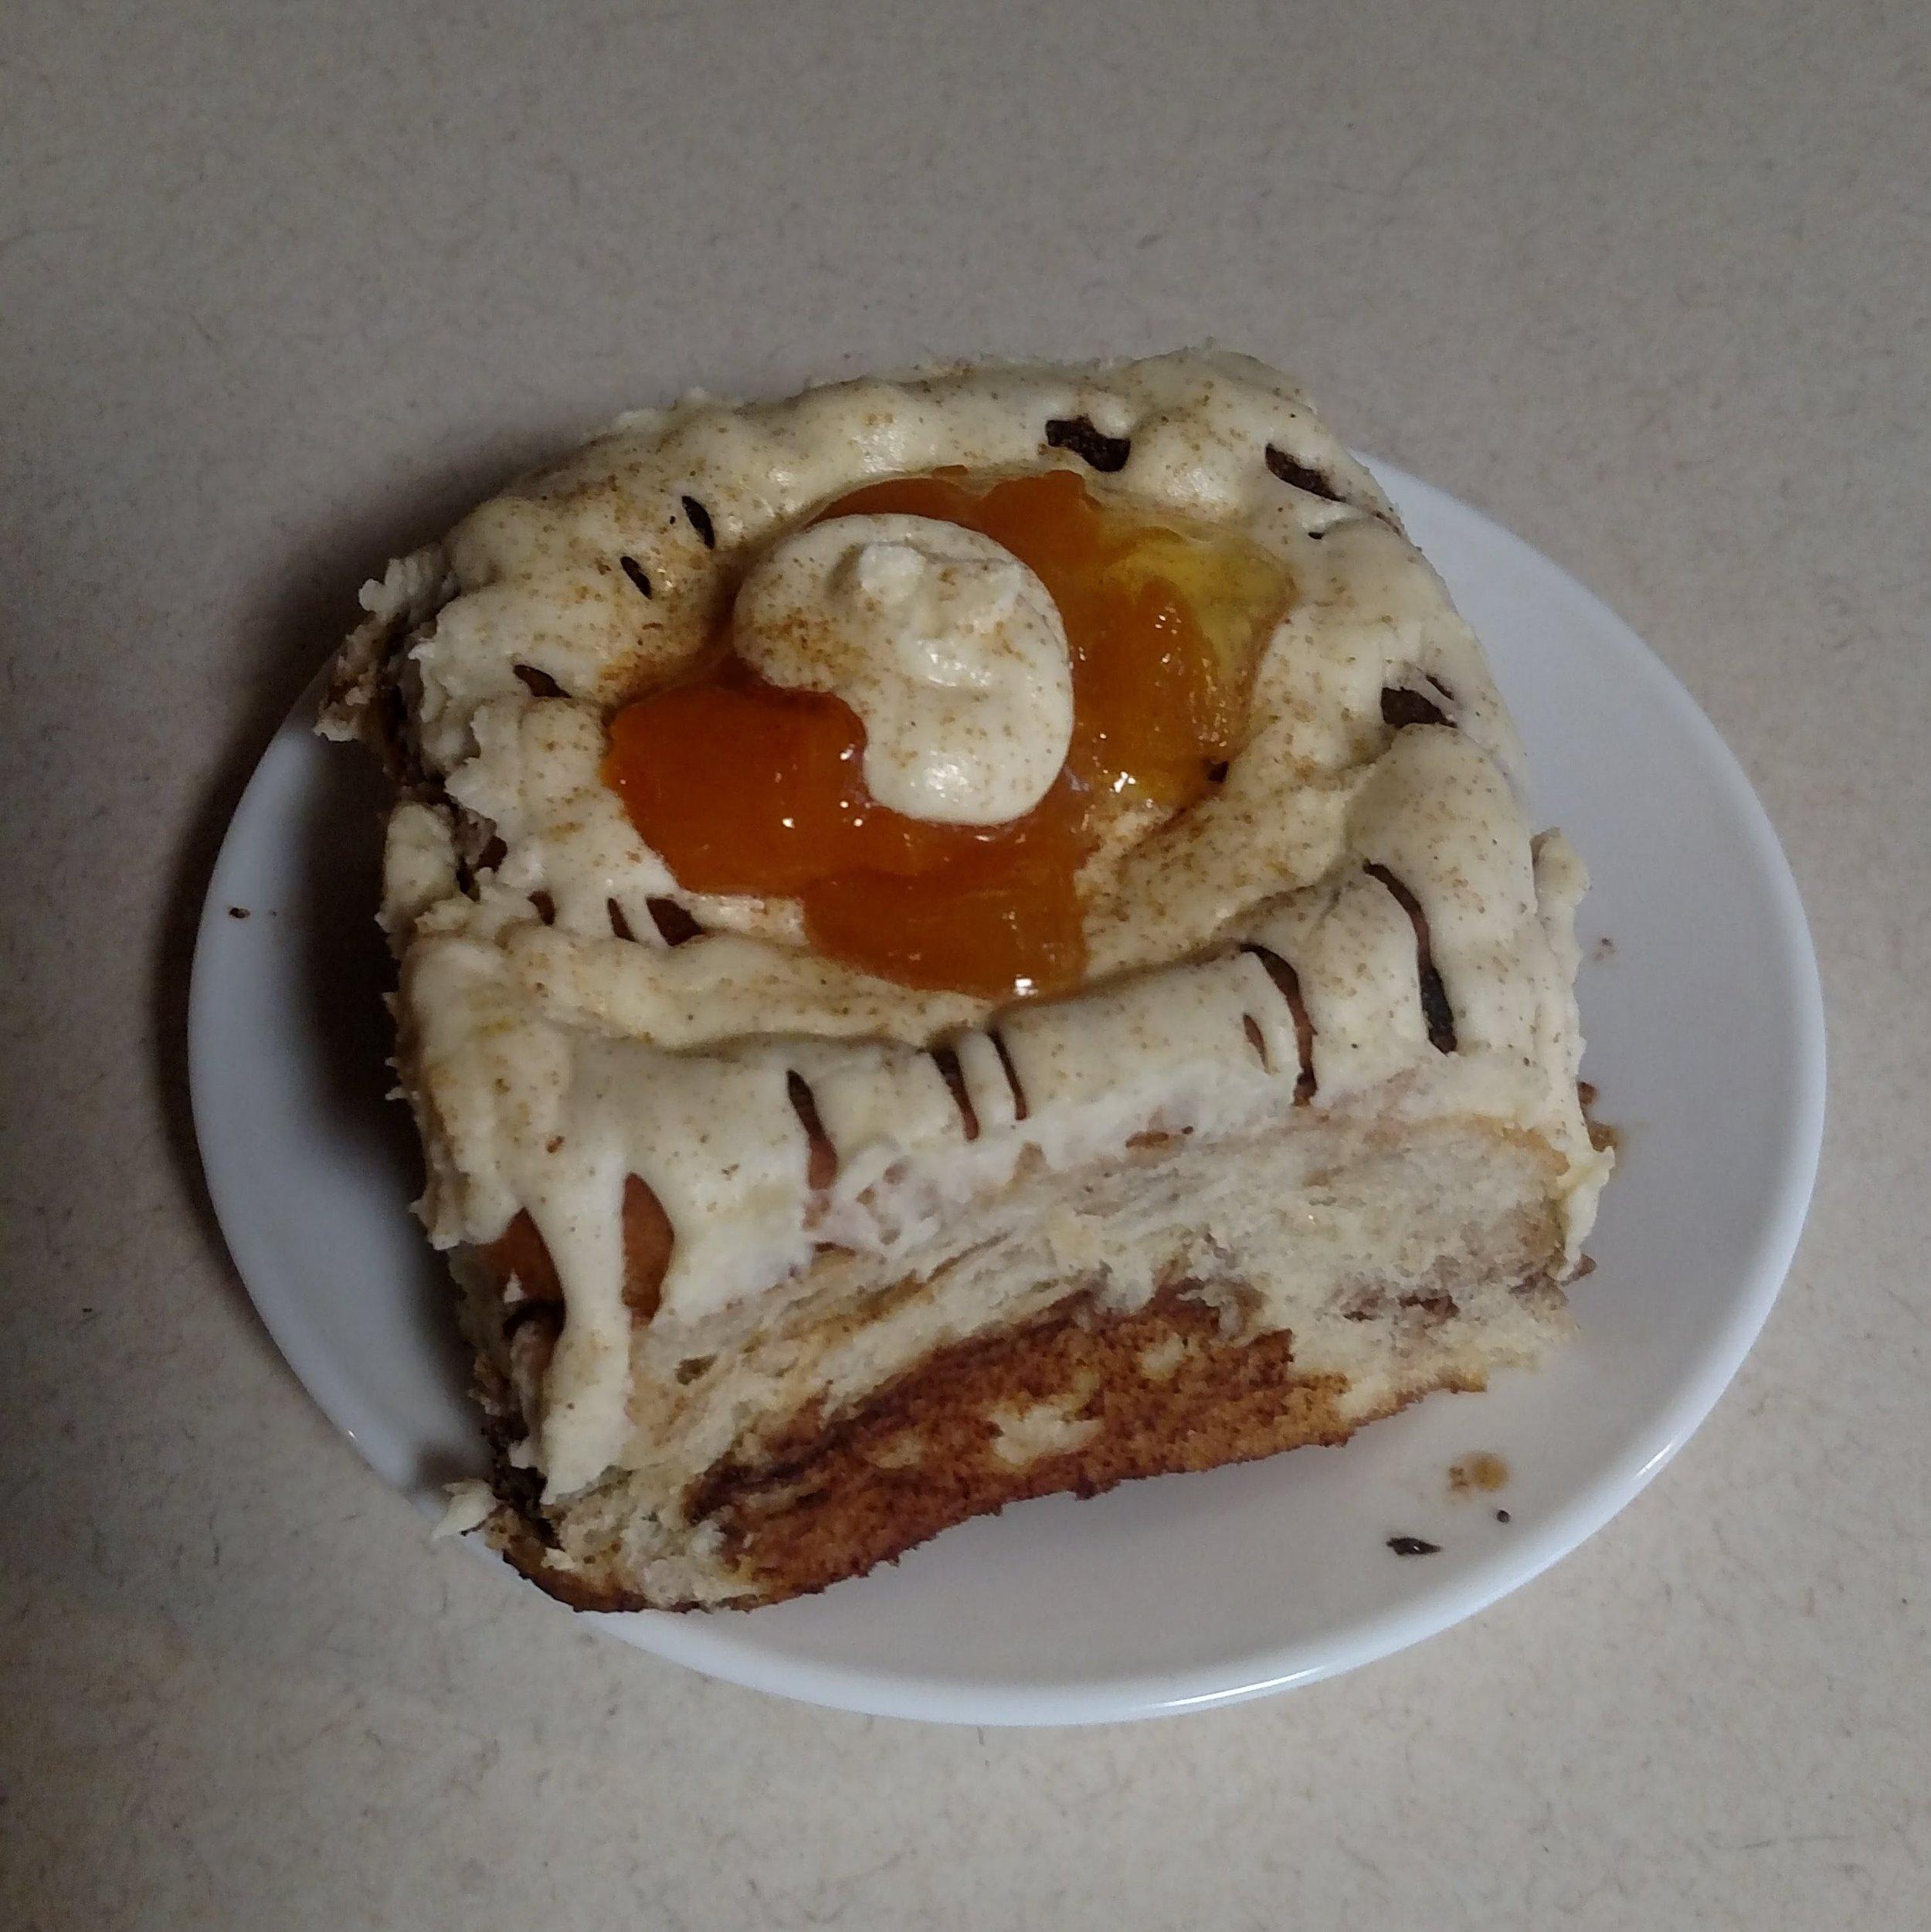 Peach Cobbler Cinnamom Grand Blanc, MI